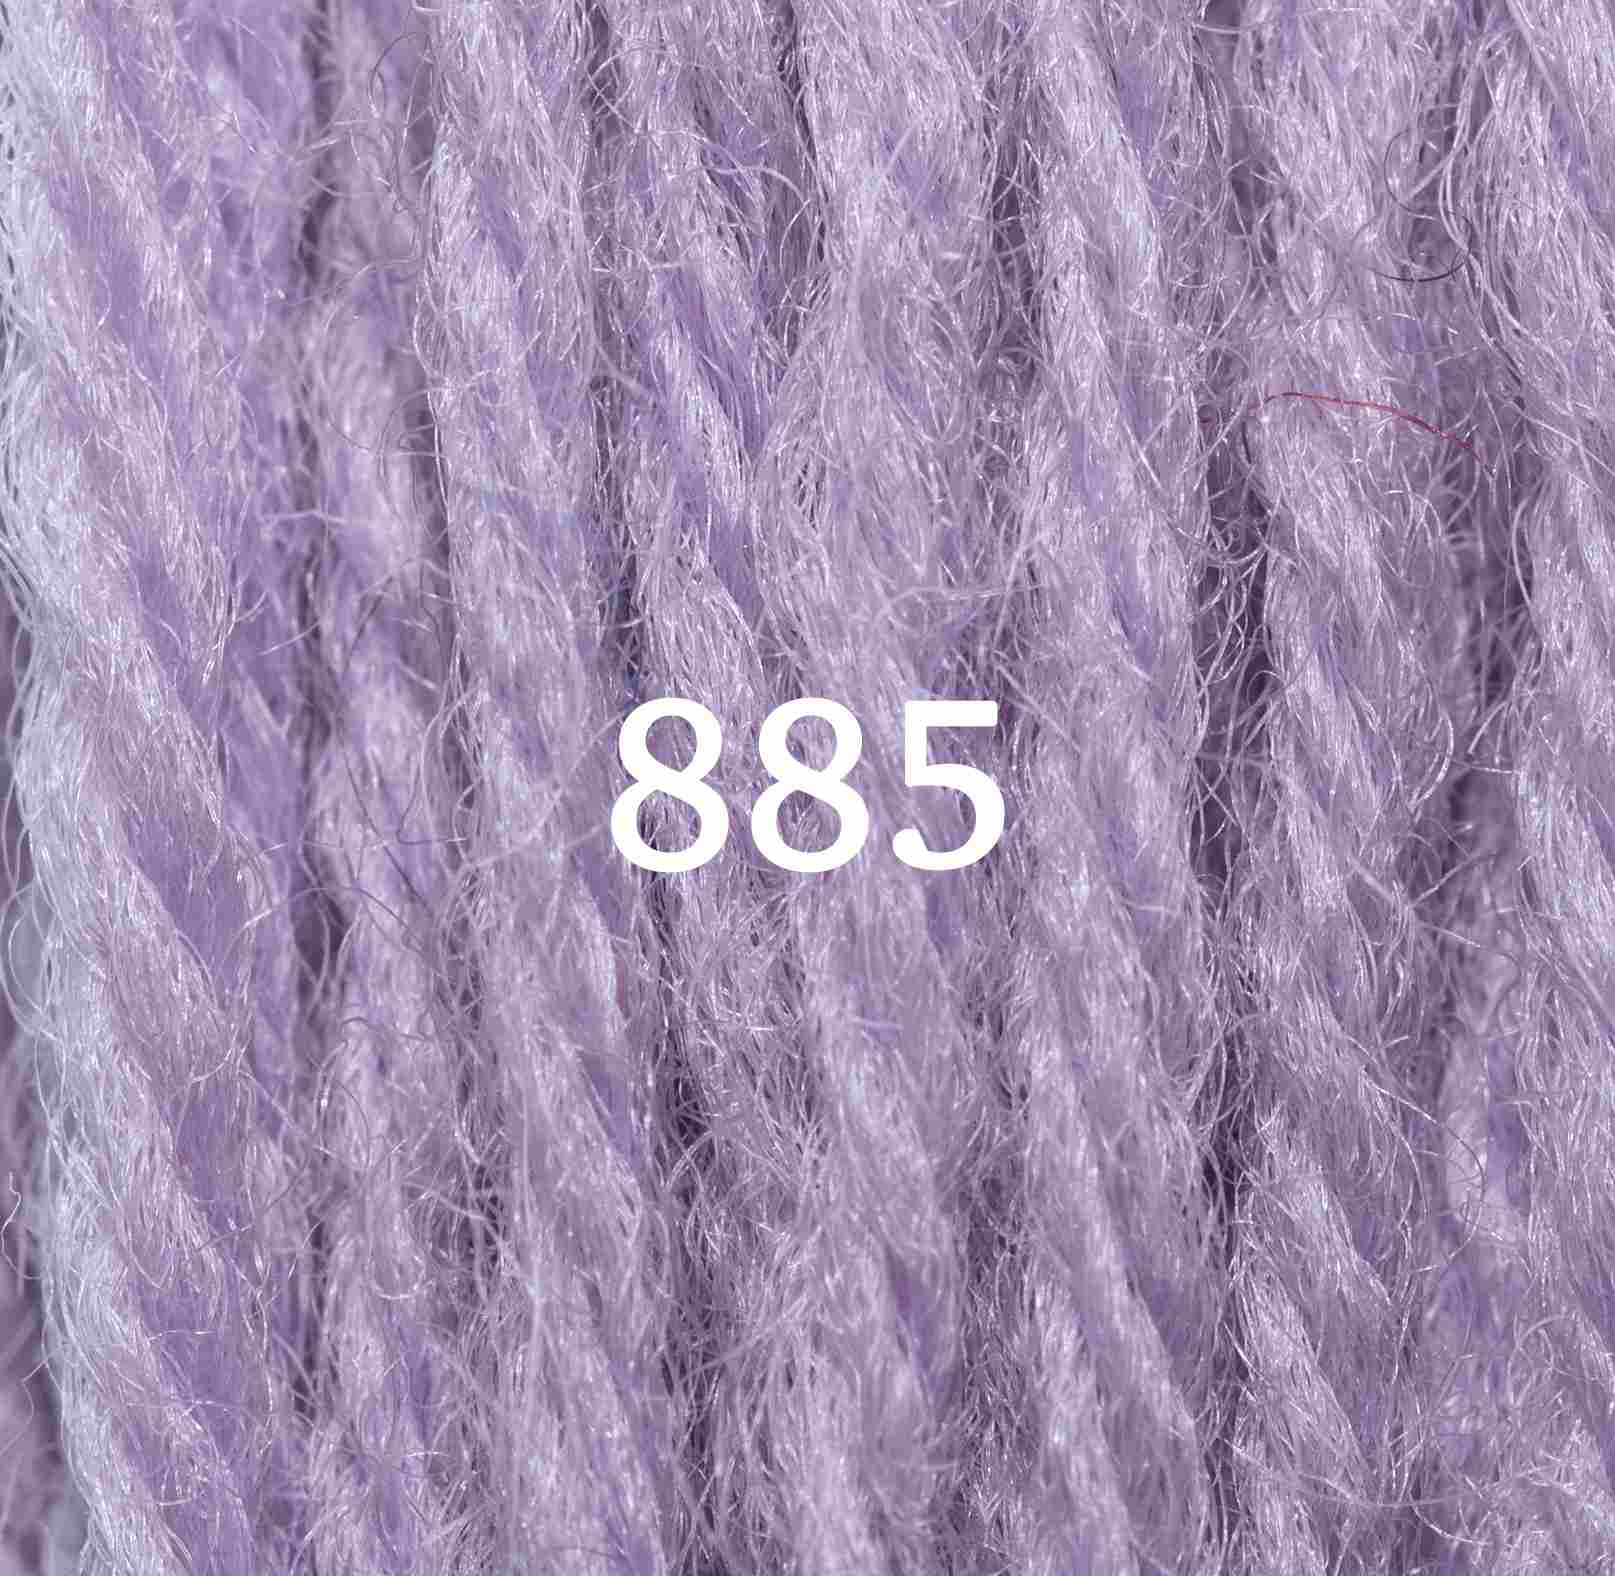 Pastel-Shades-2-885